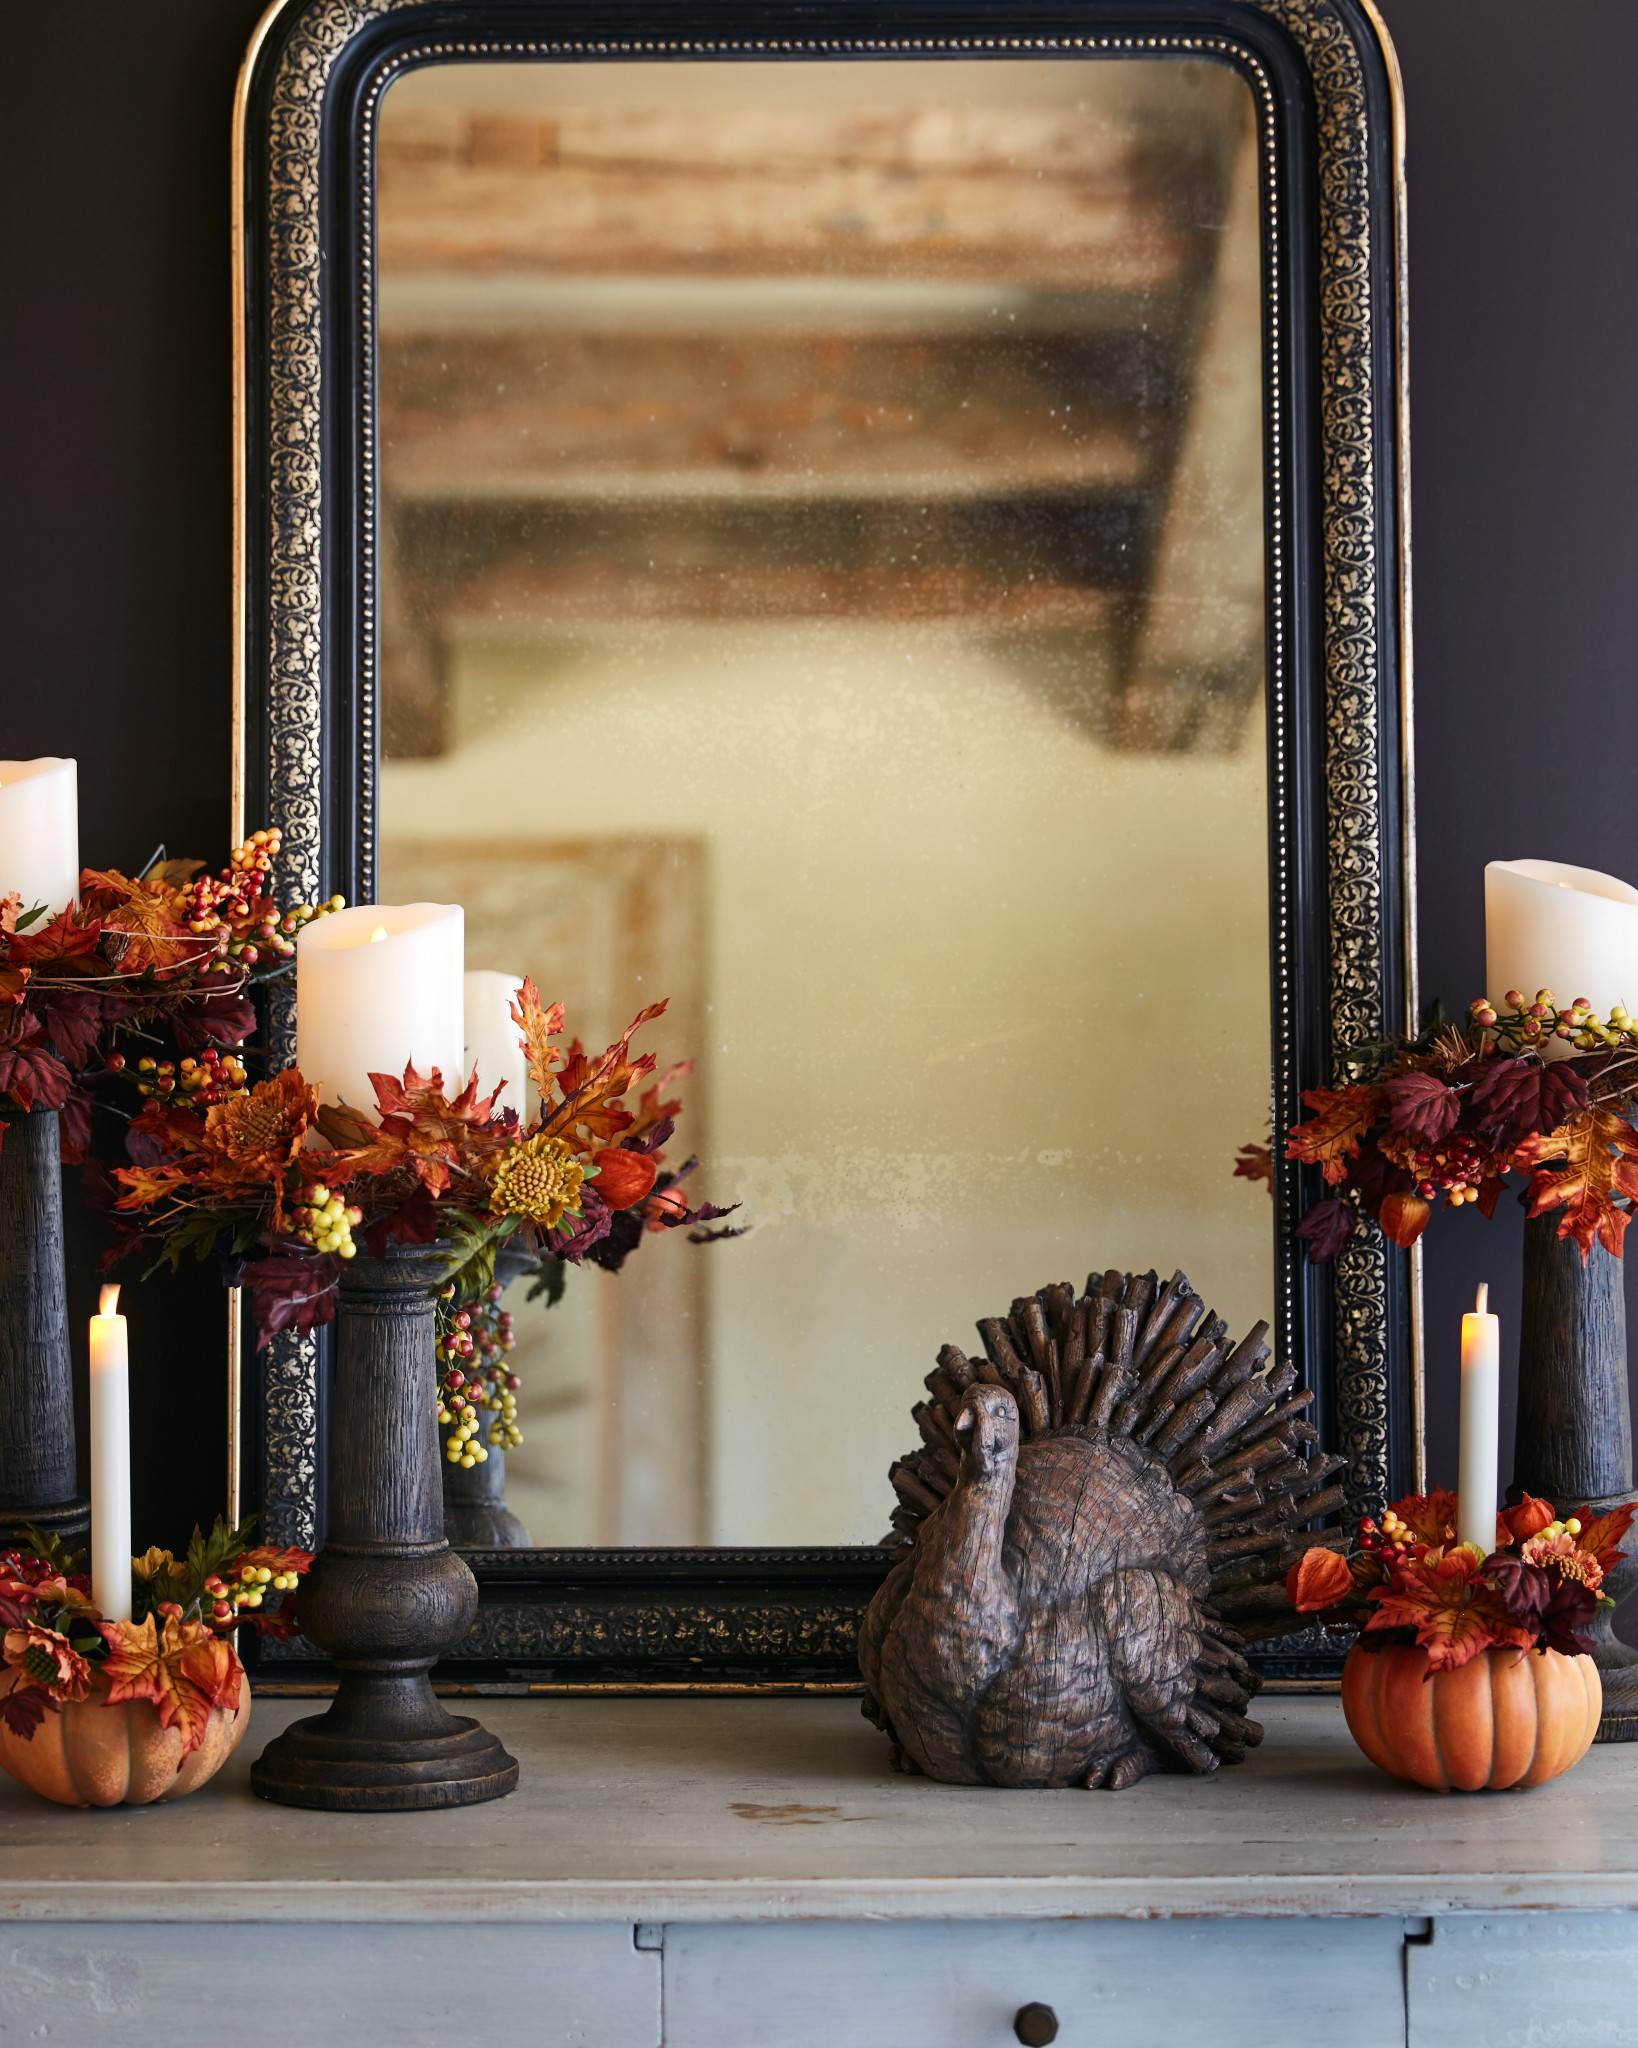 Autumn Medley Candle Foliage | Balsam Hill